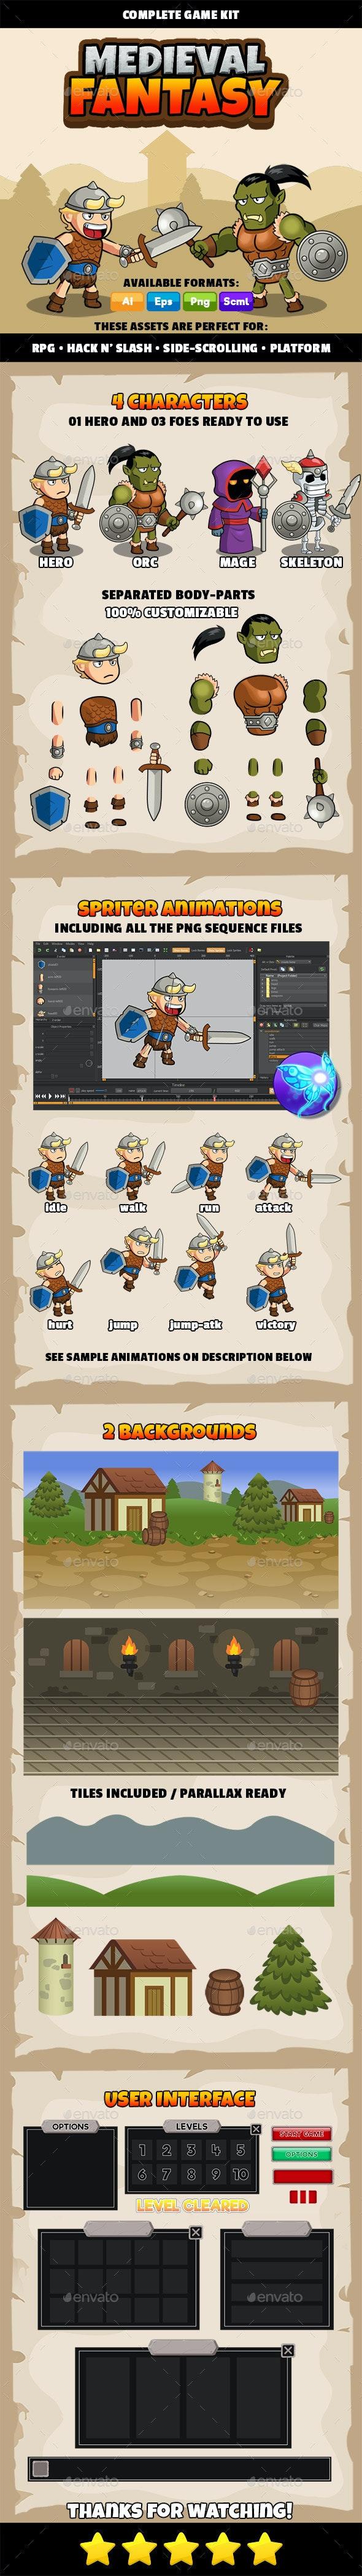 Medieval Fantasy - Complete Game Kit - Game Kits Game Assets